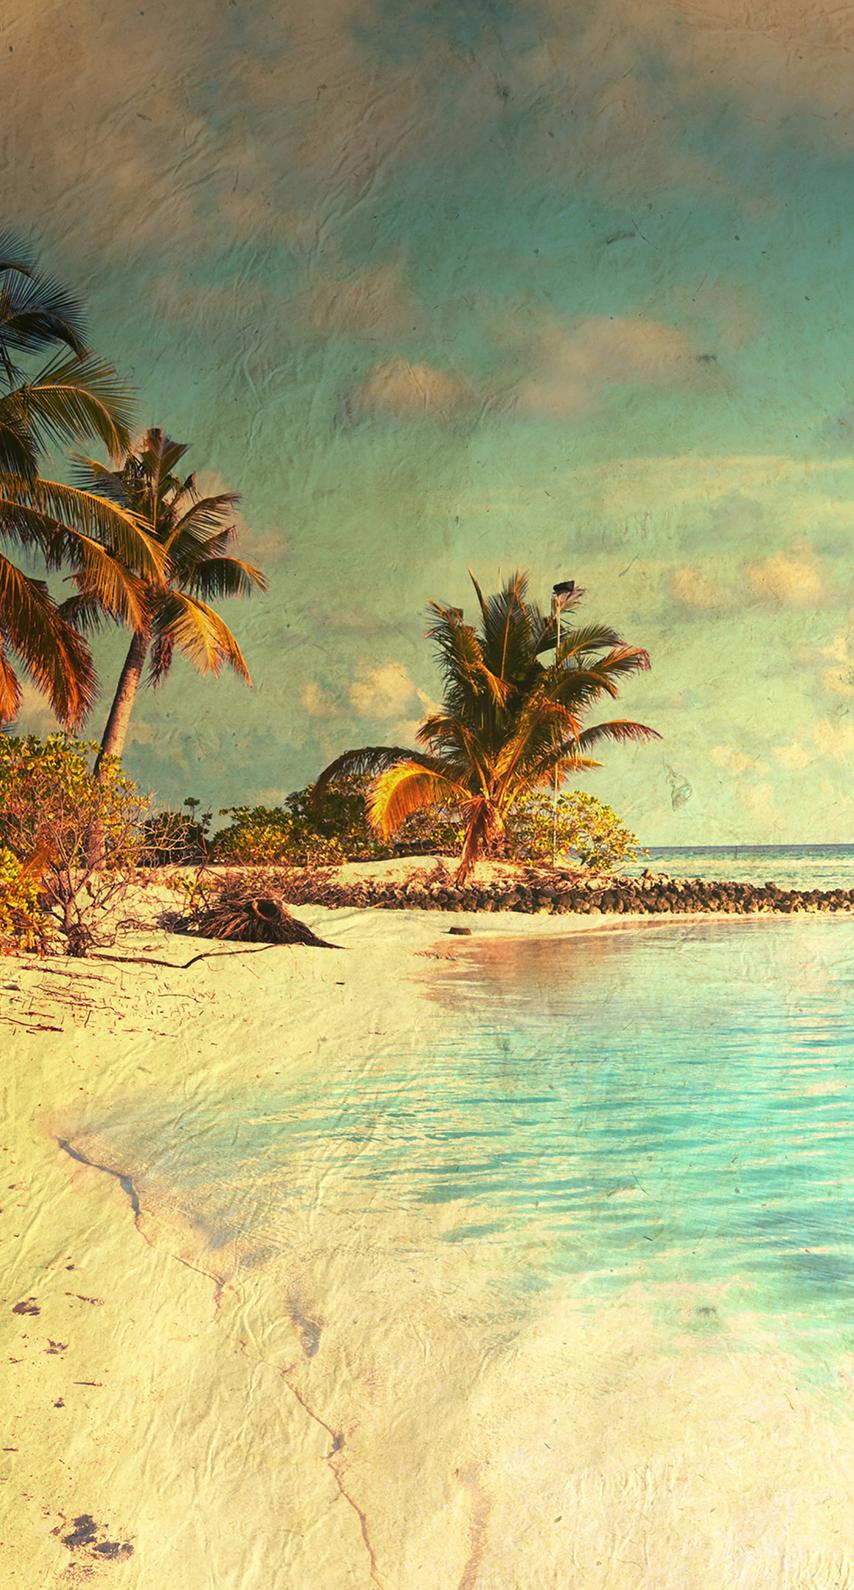 sand, sun, idyllic, relaxation, seascape, palm, seashore, coconut, lagoon